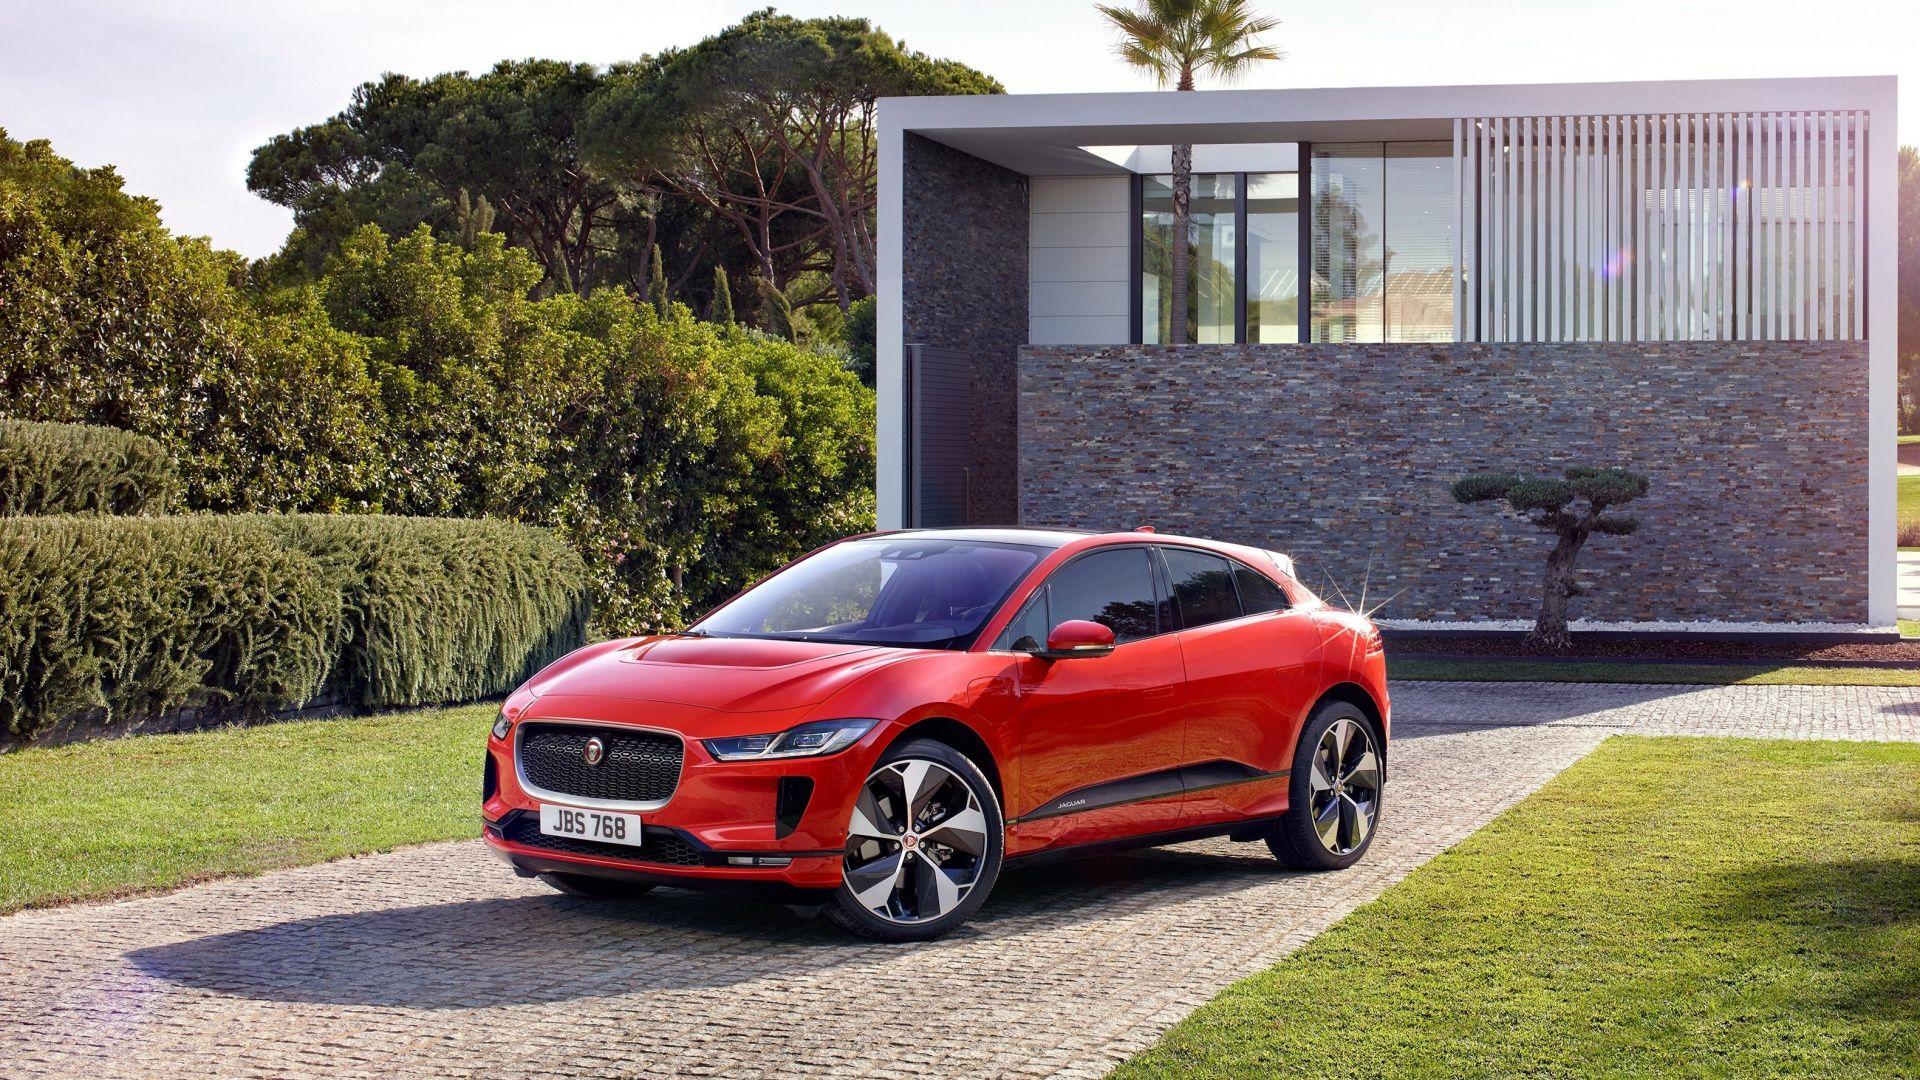 Jaguar I Pace Ev400 Awd Hse 1920x1080 Need Trendy Iphone7